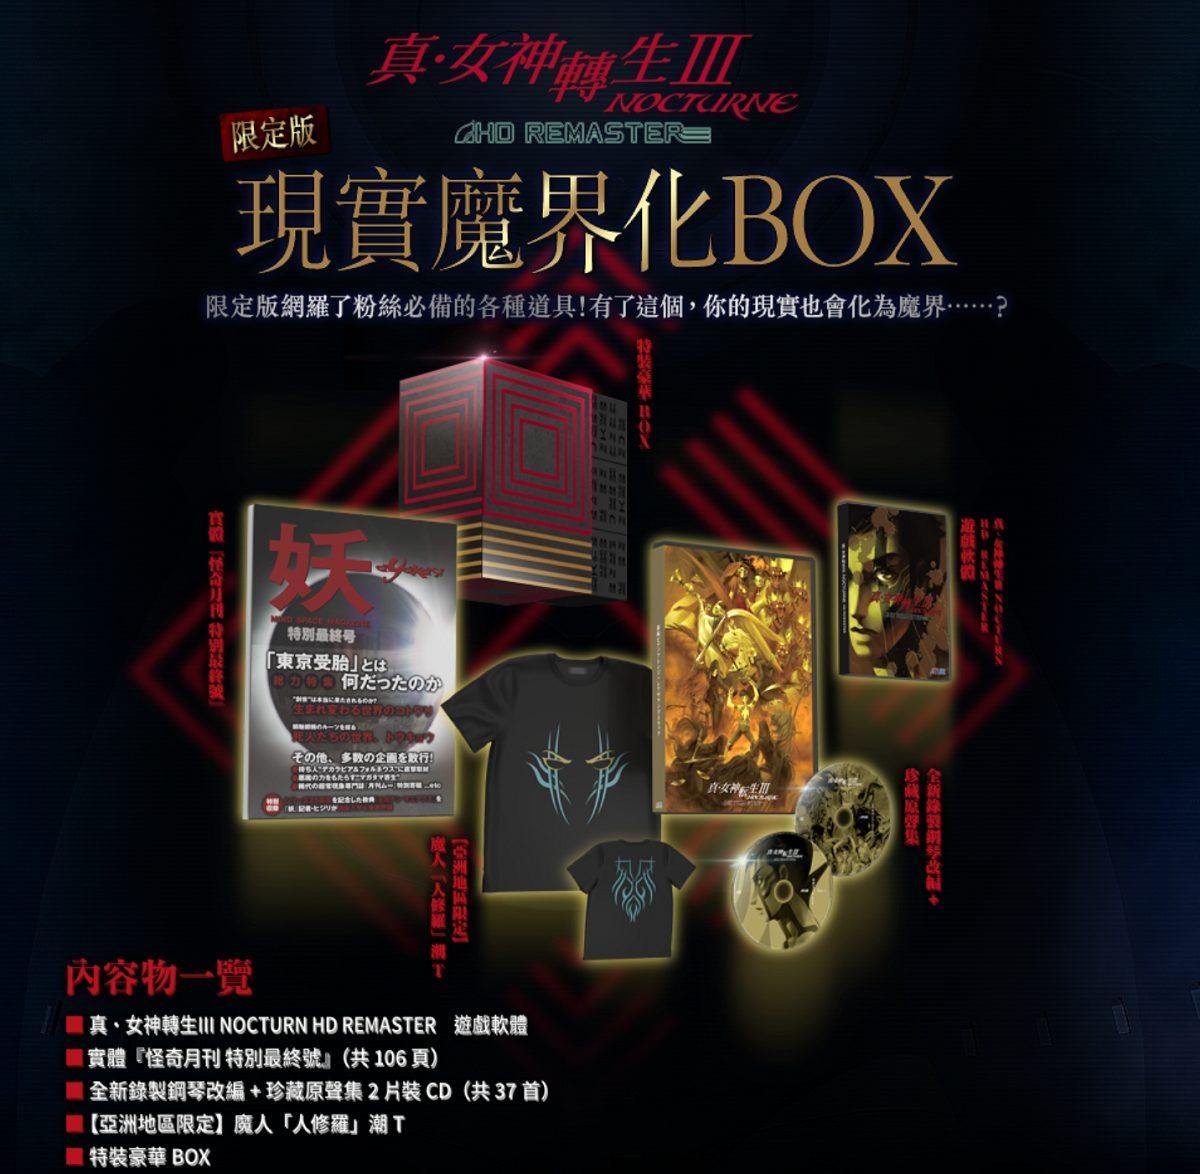 真・女神轉生Ⅲ NOCTURNE HD REMASTER 現實魔界化BOX